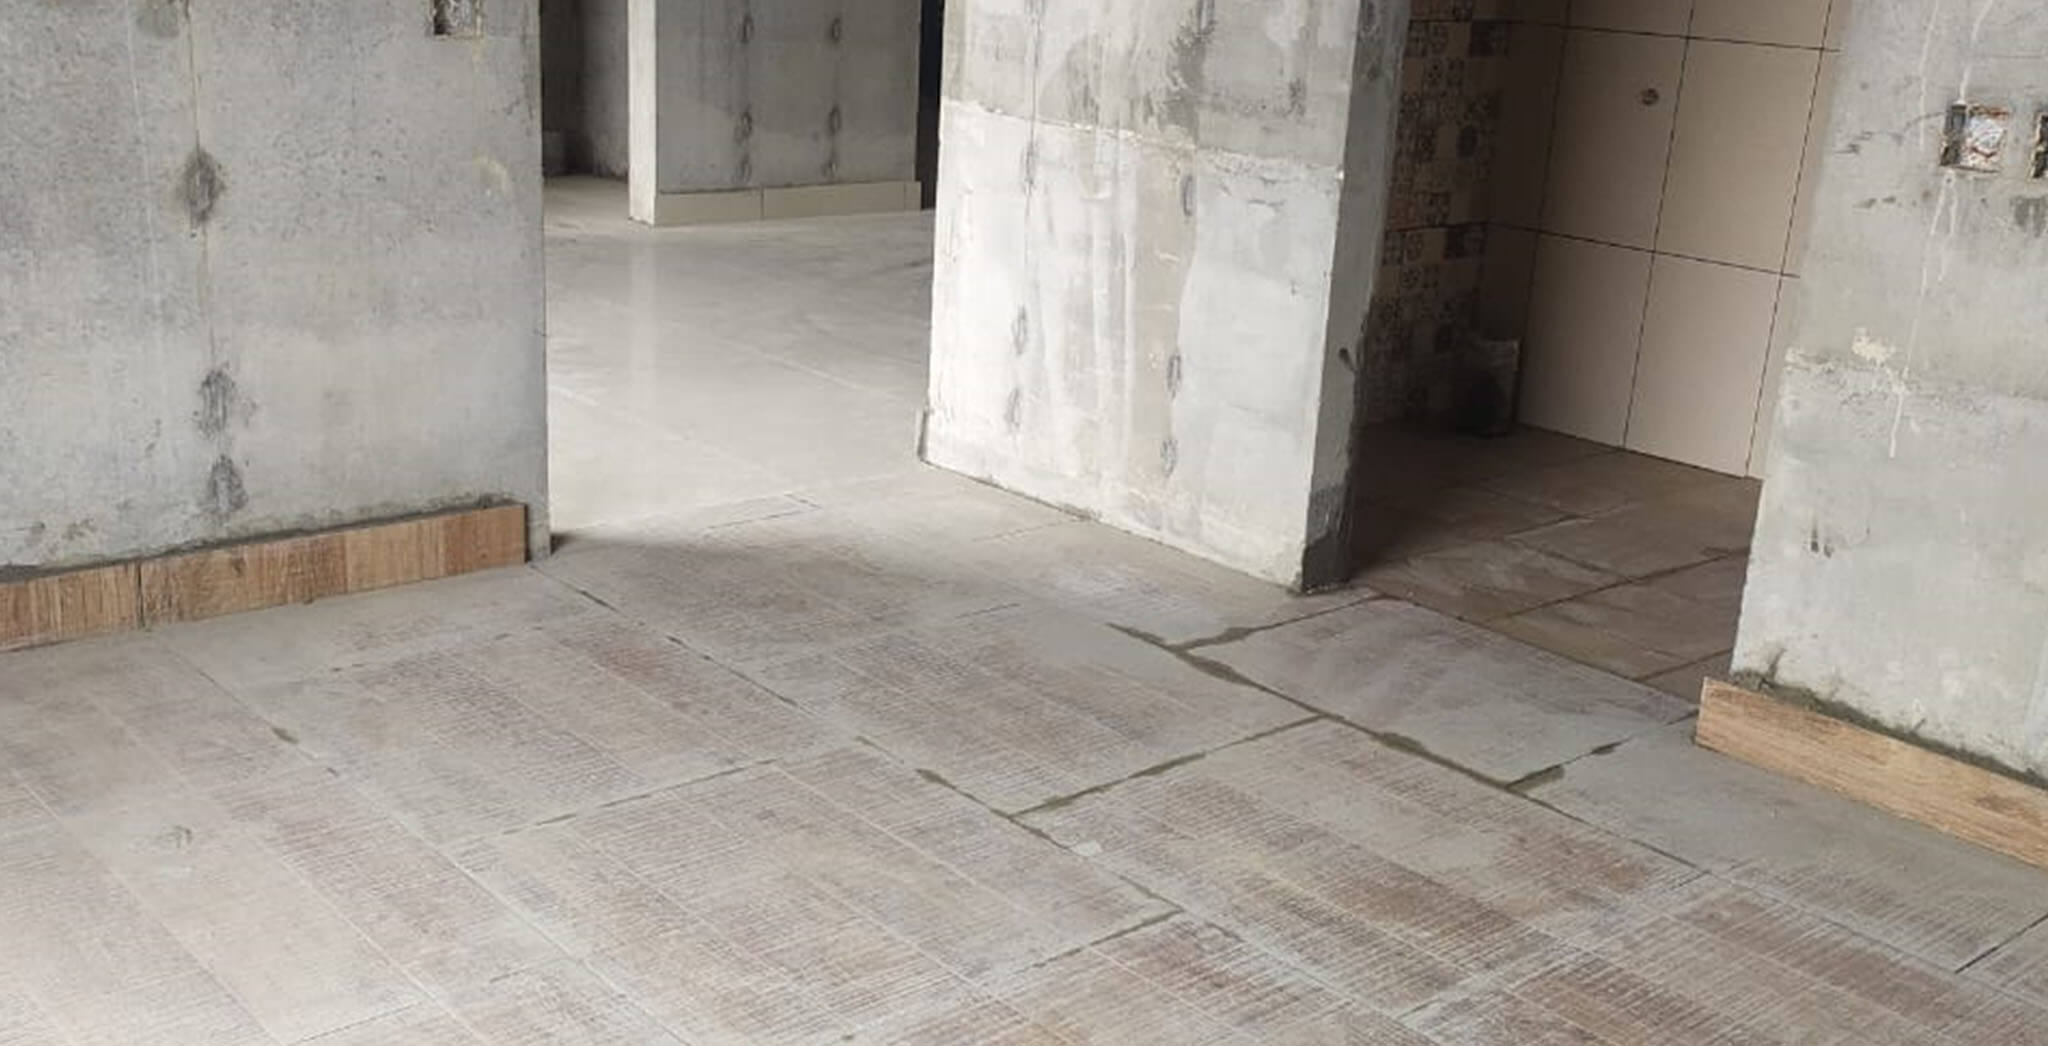 Jun 2021 - Gallium: On commencement of flooring ground floor to 8th floor